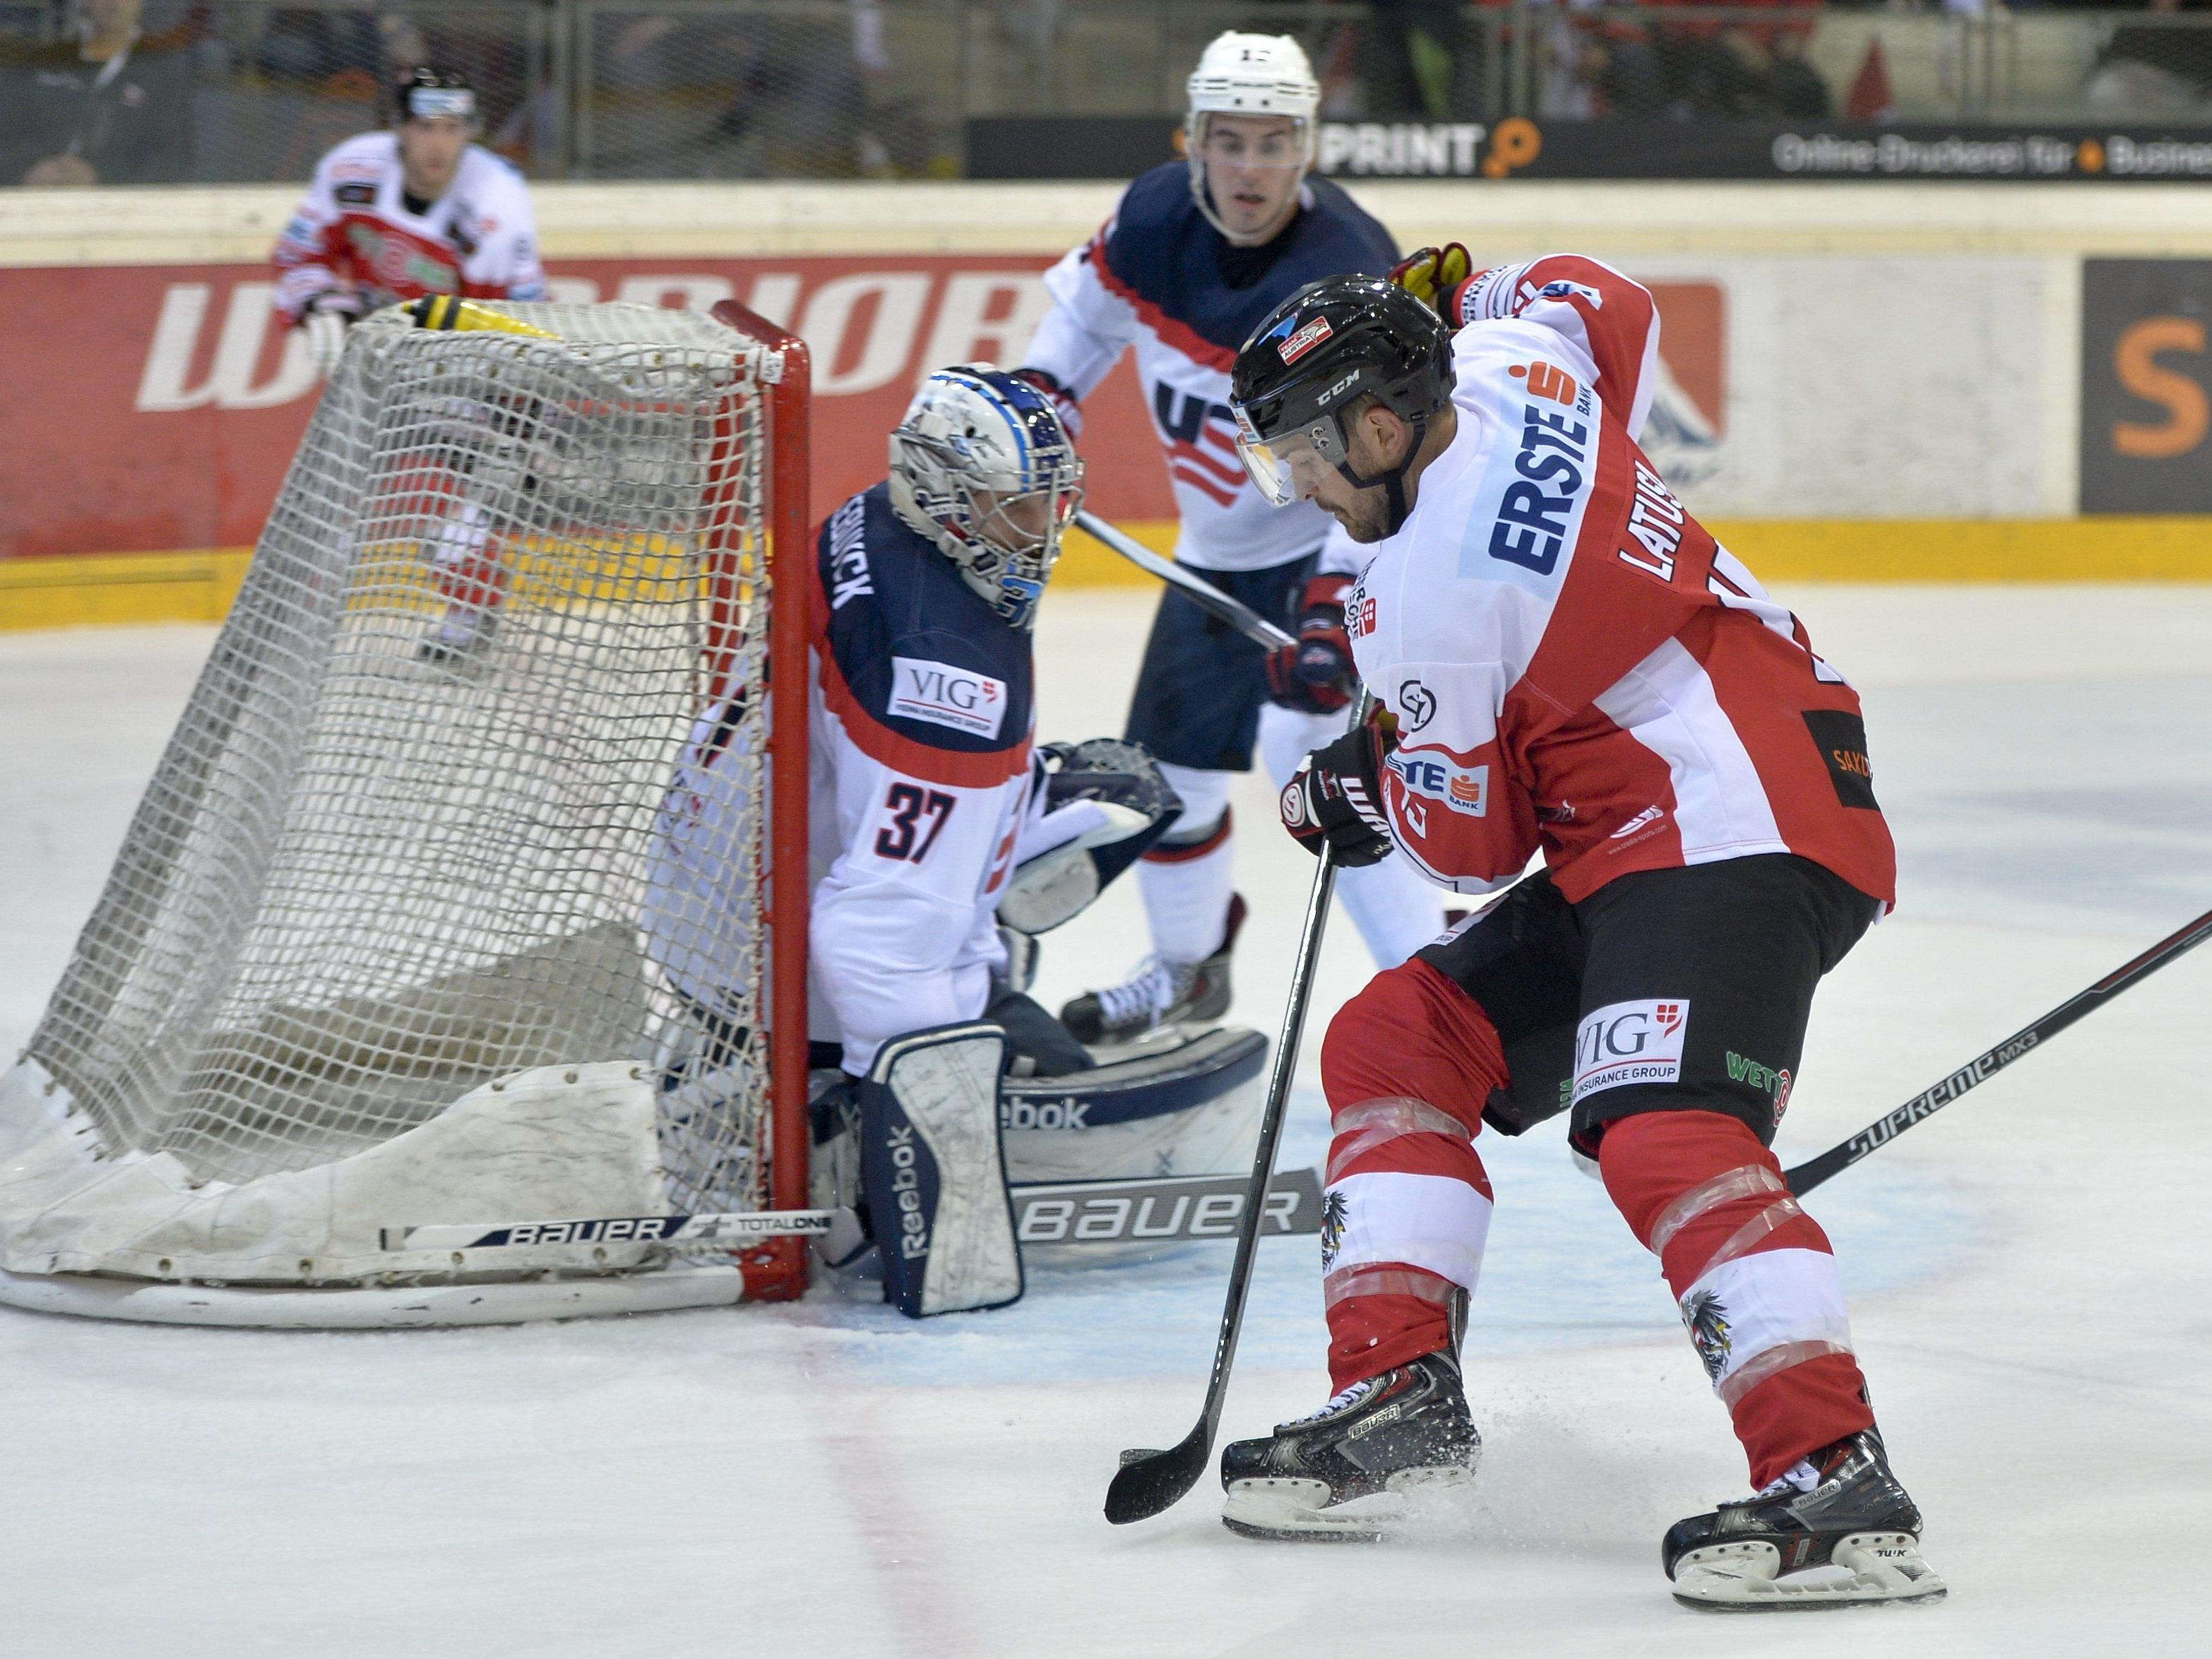 Eishockey: ÖEHV-Team unterlag USA mit 1:4